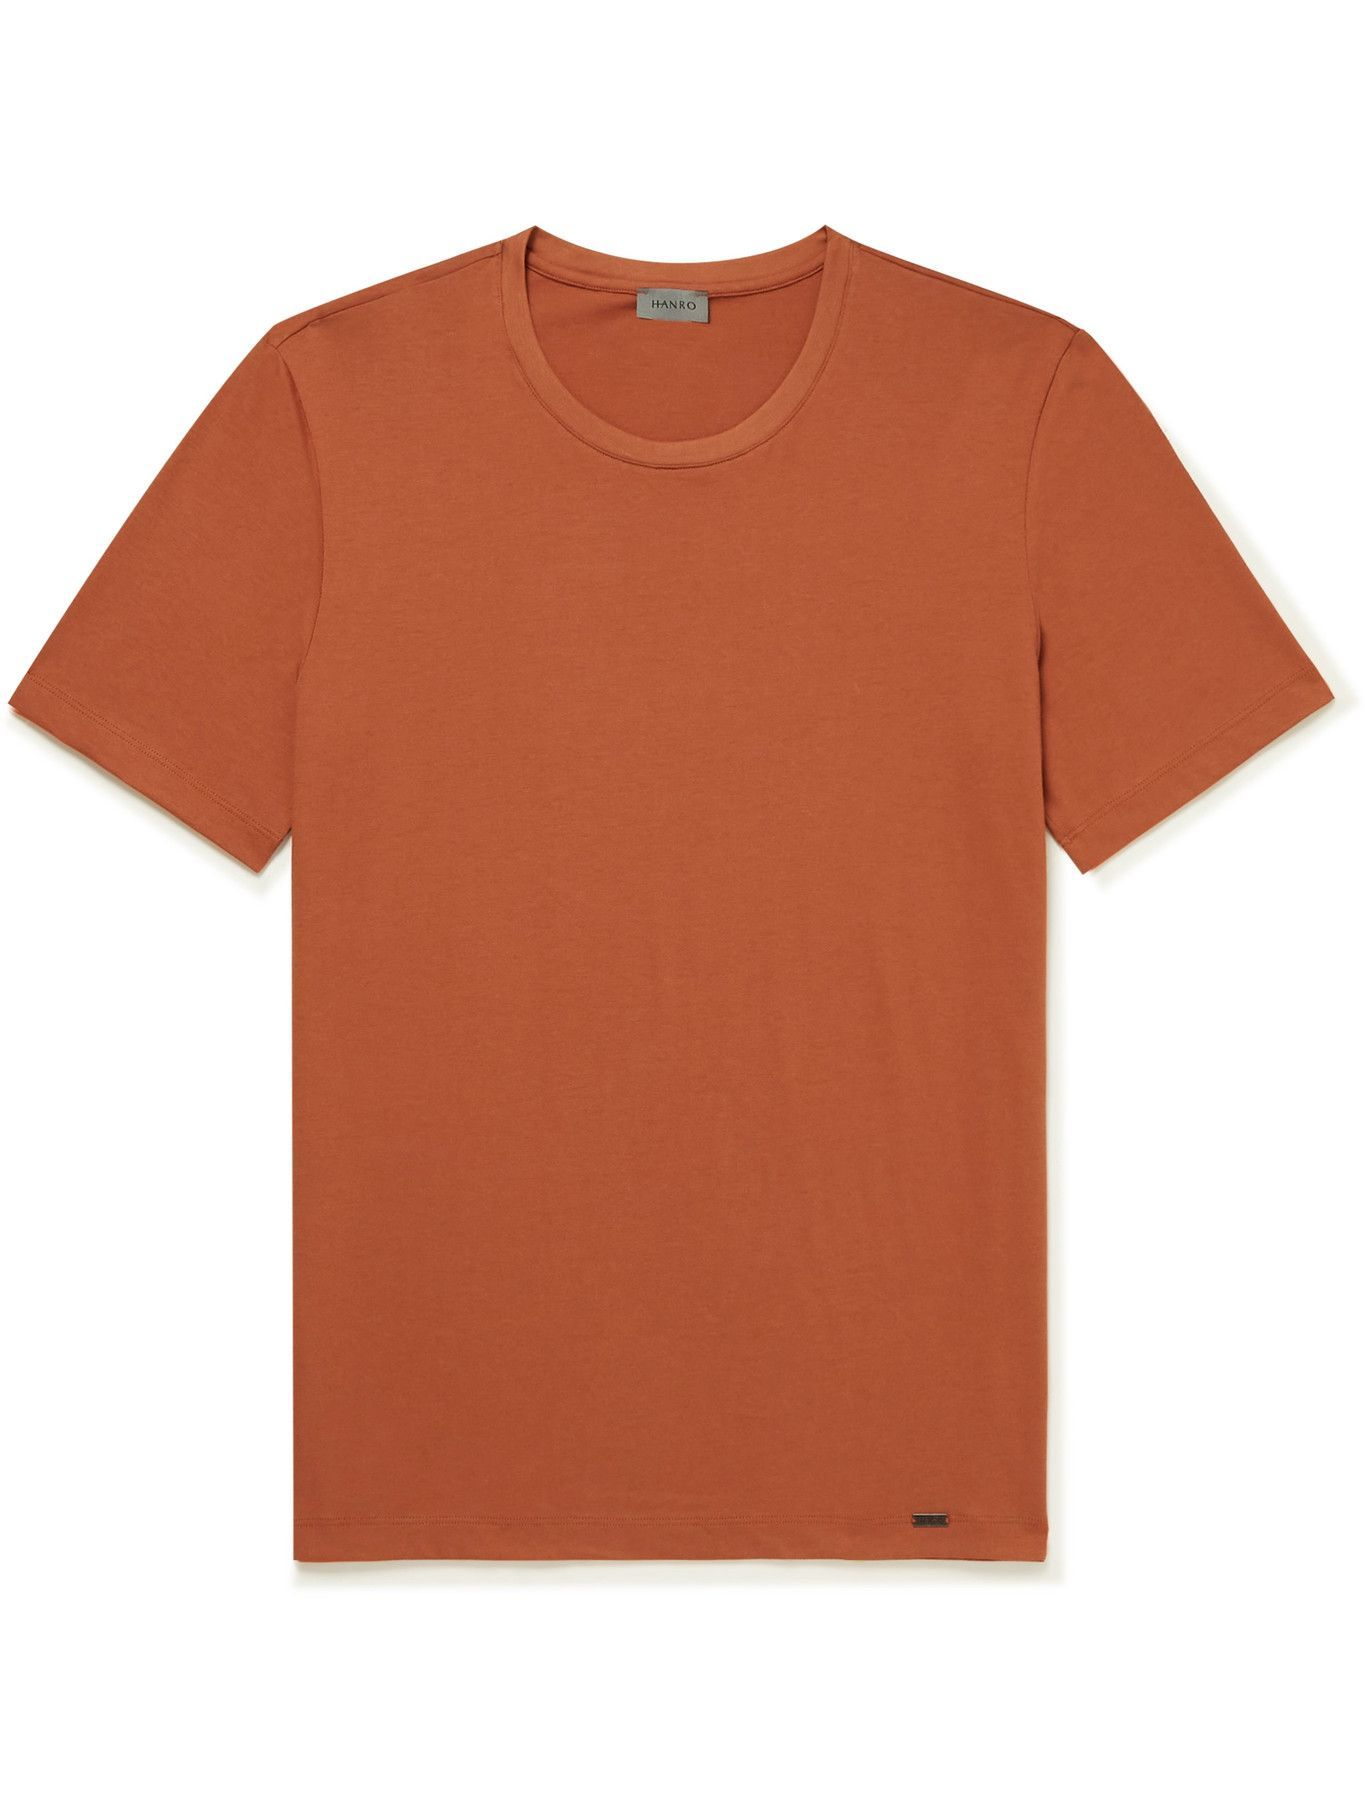 Hanro - Night & Day Cotton-Jersey Pyjama Top - Orange